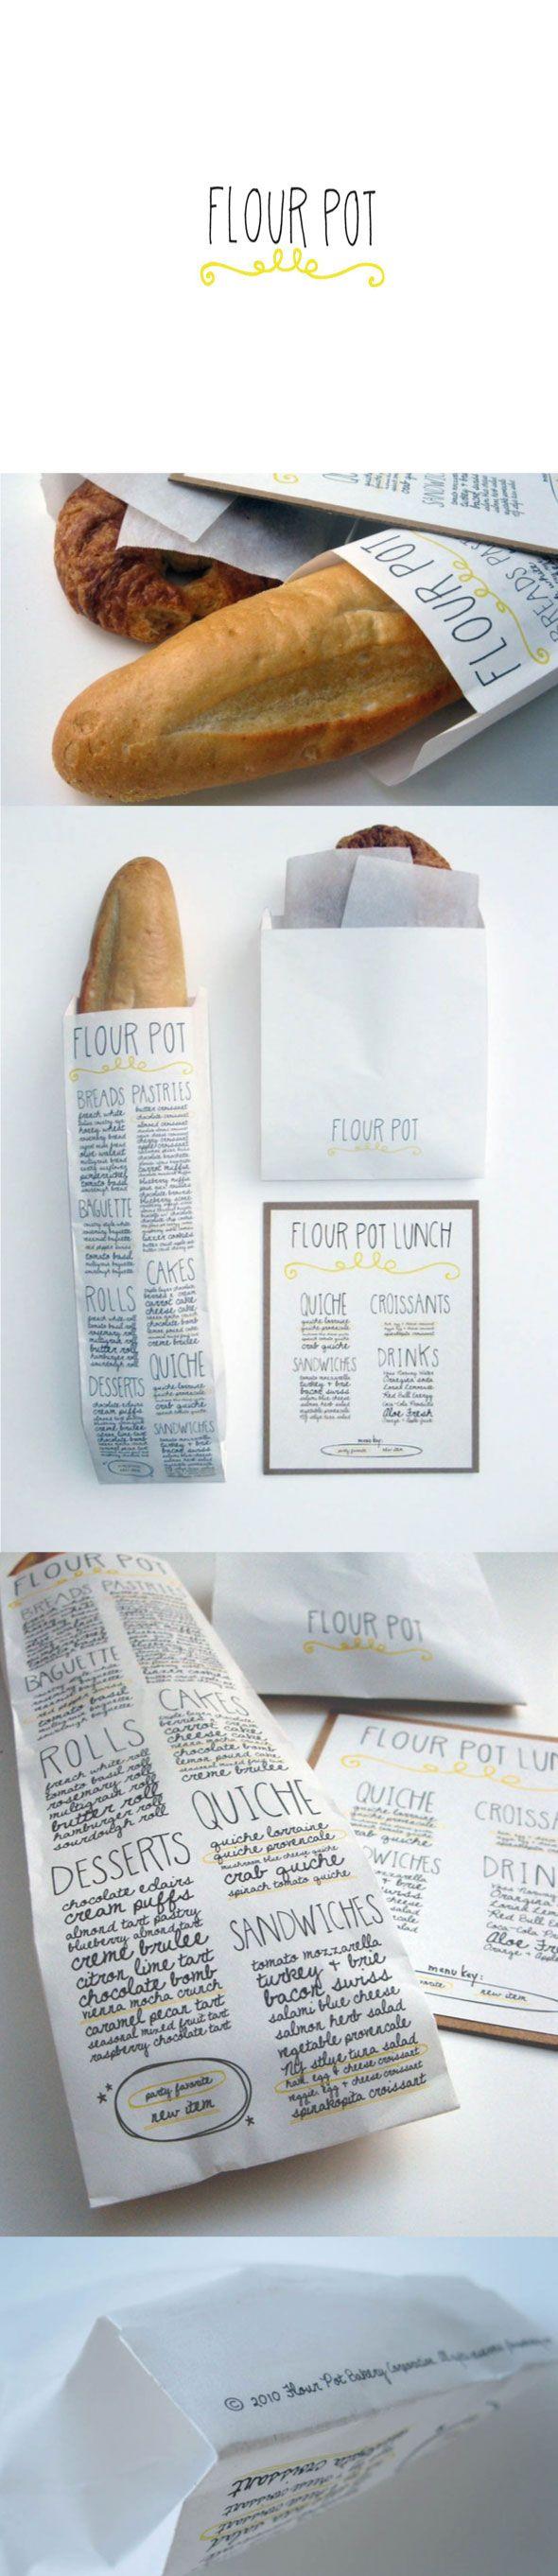 The Flour Pot Bakery  designer : Sara Nicely